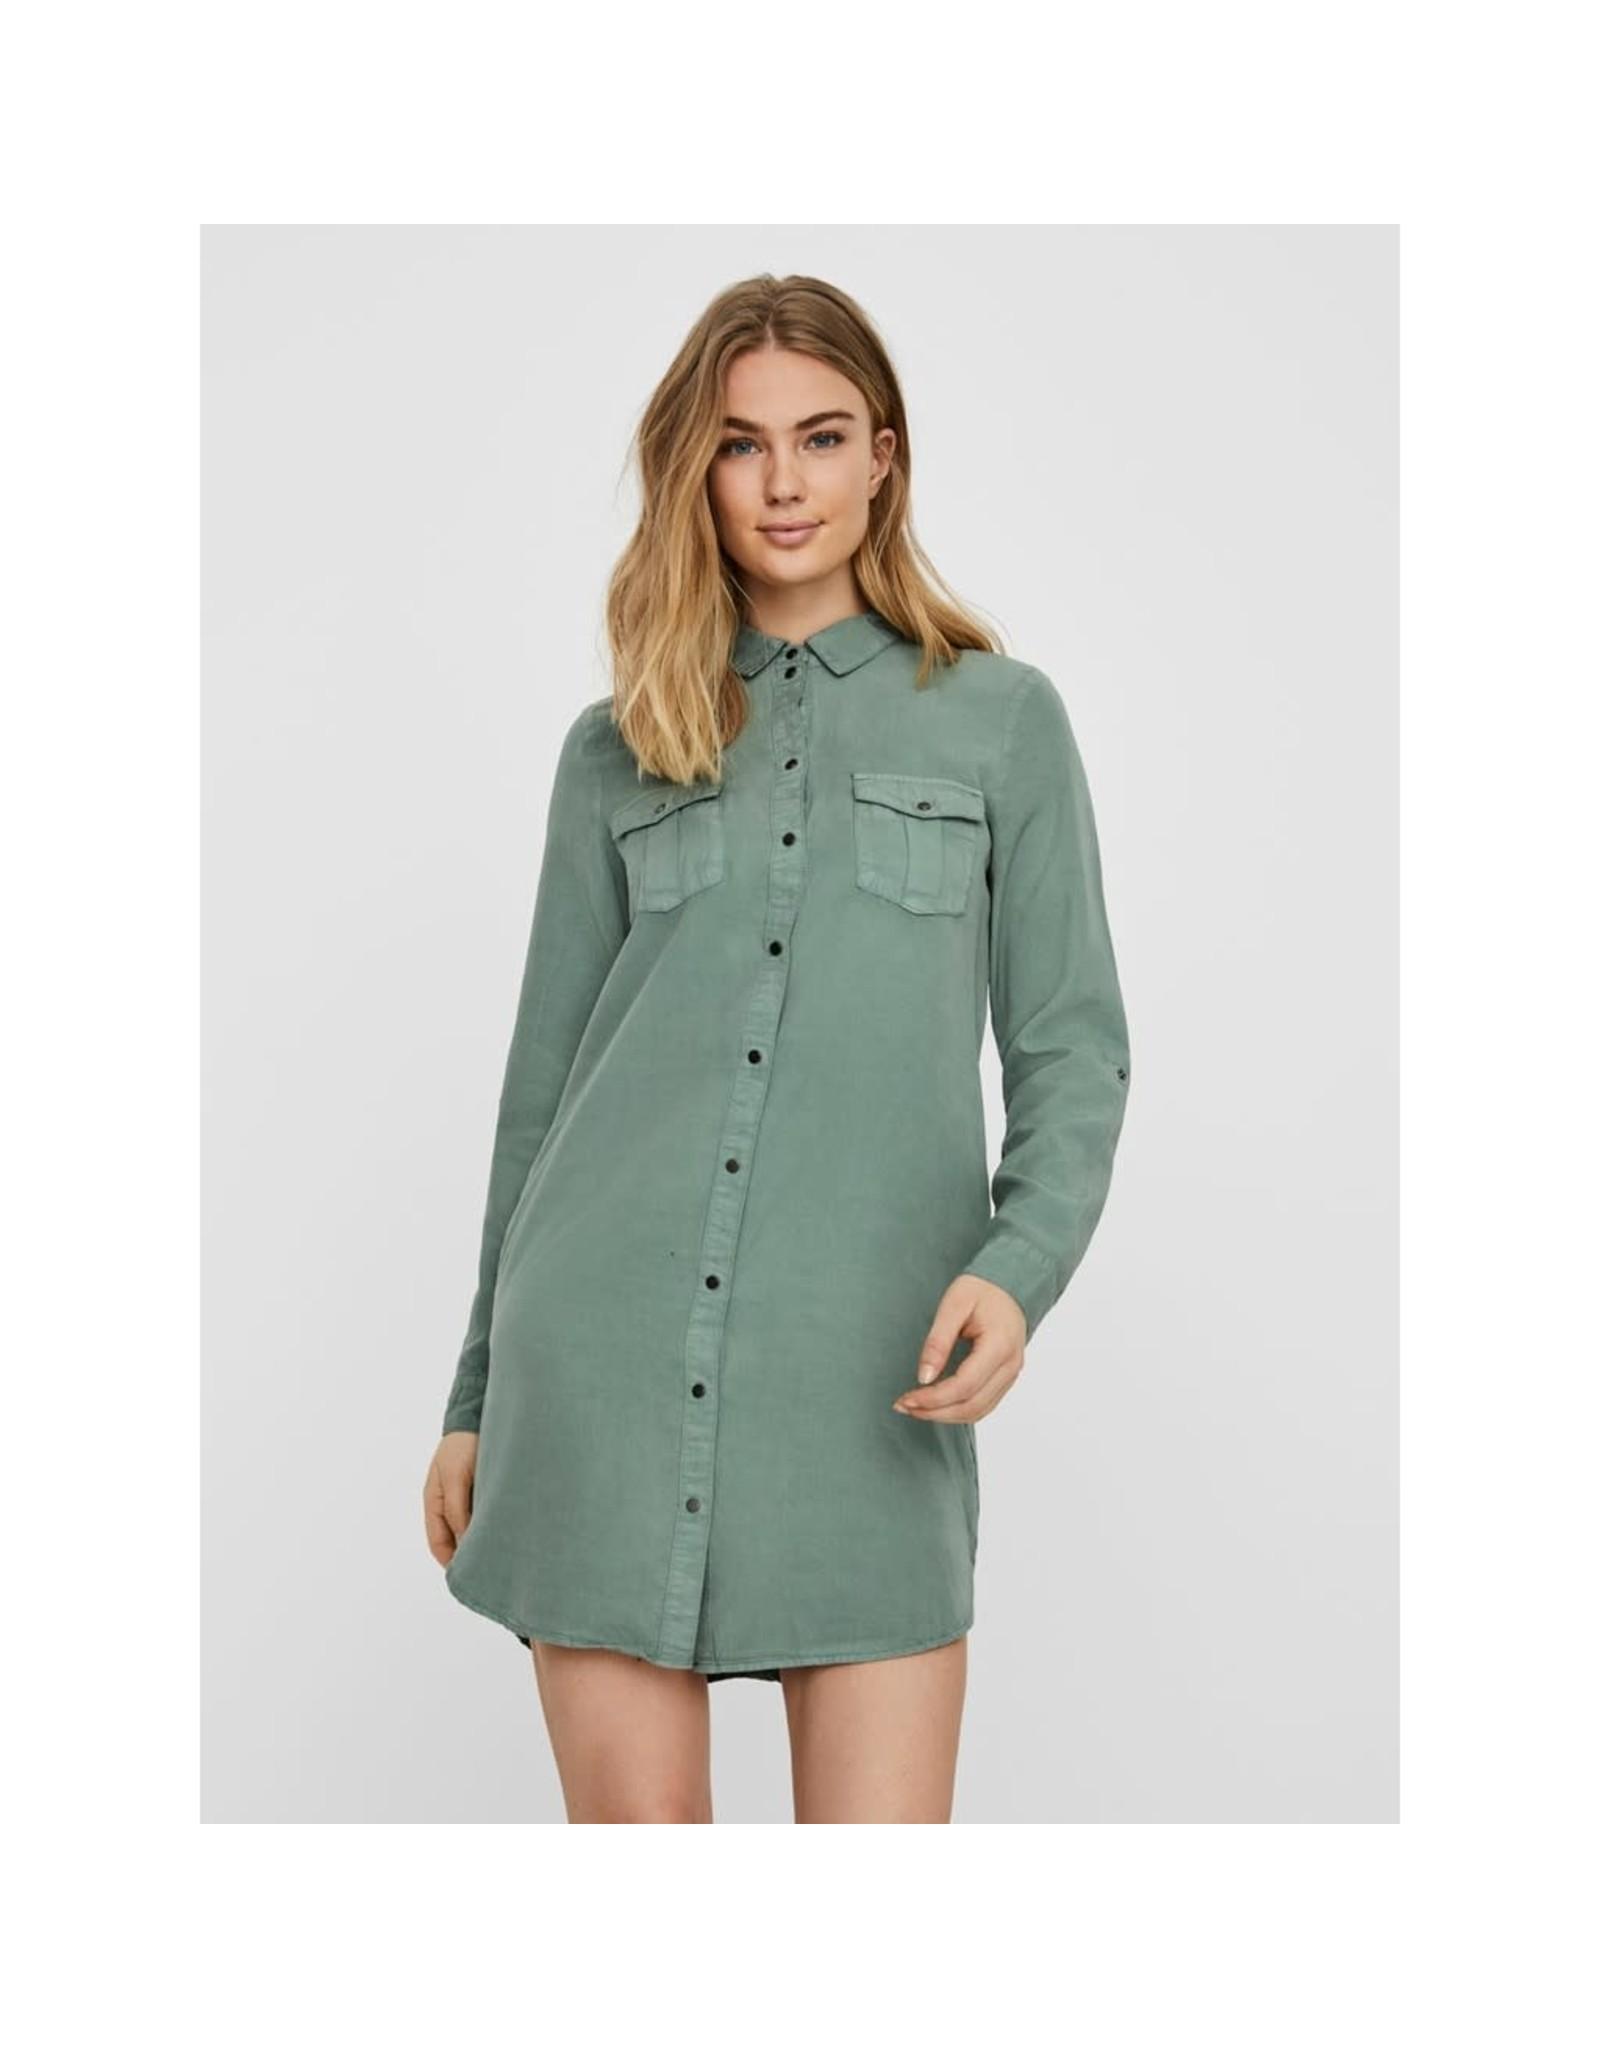 Vero Moda Vero Moda - Silla Shirt Dress